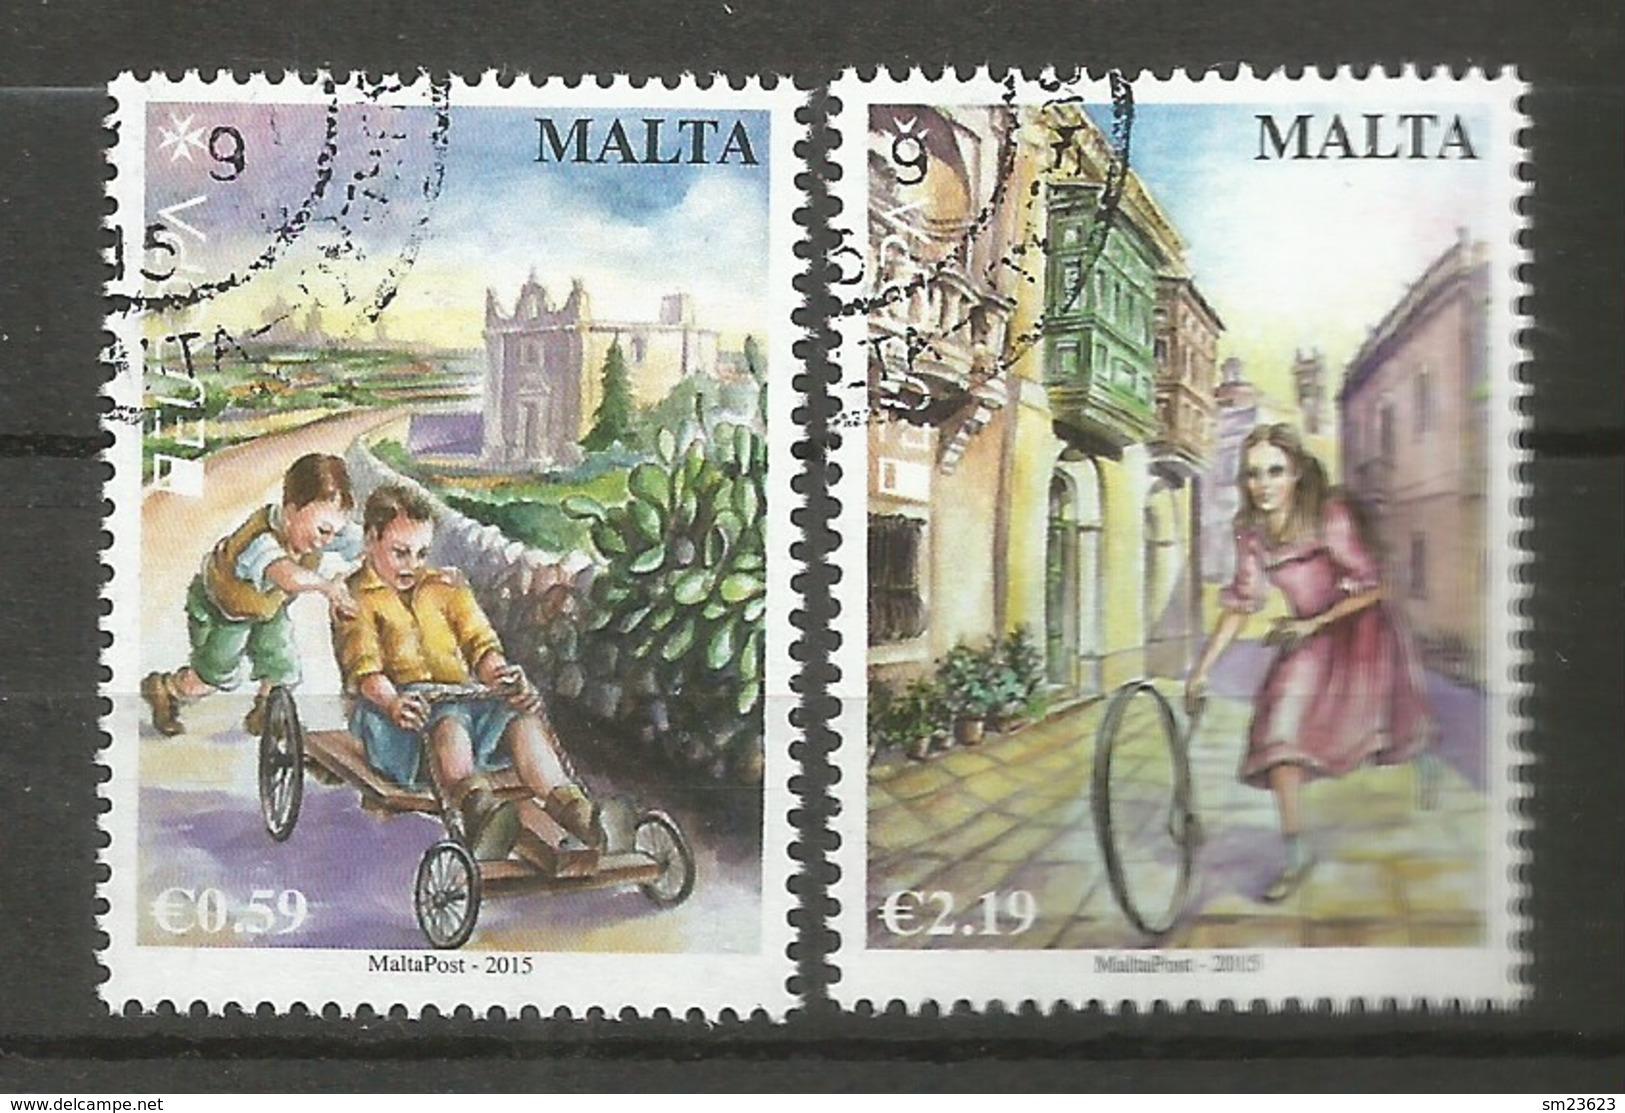 Malta  2015  Mi.Nr. 1903 / 1904 , EUROPA CEPT - Historisches Spielzeug - Gestempelt / Used / (o) - 2015